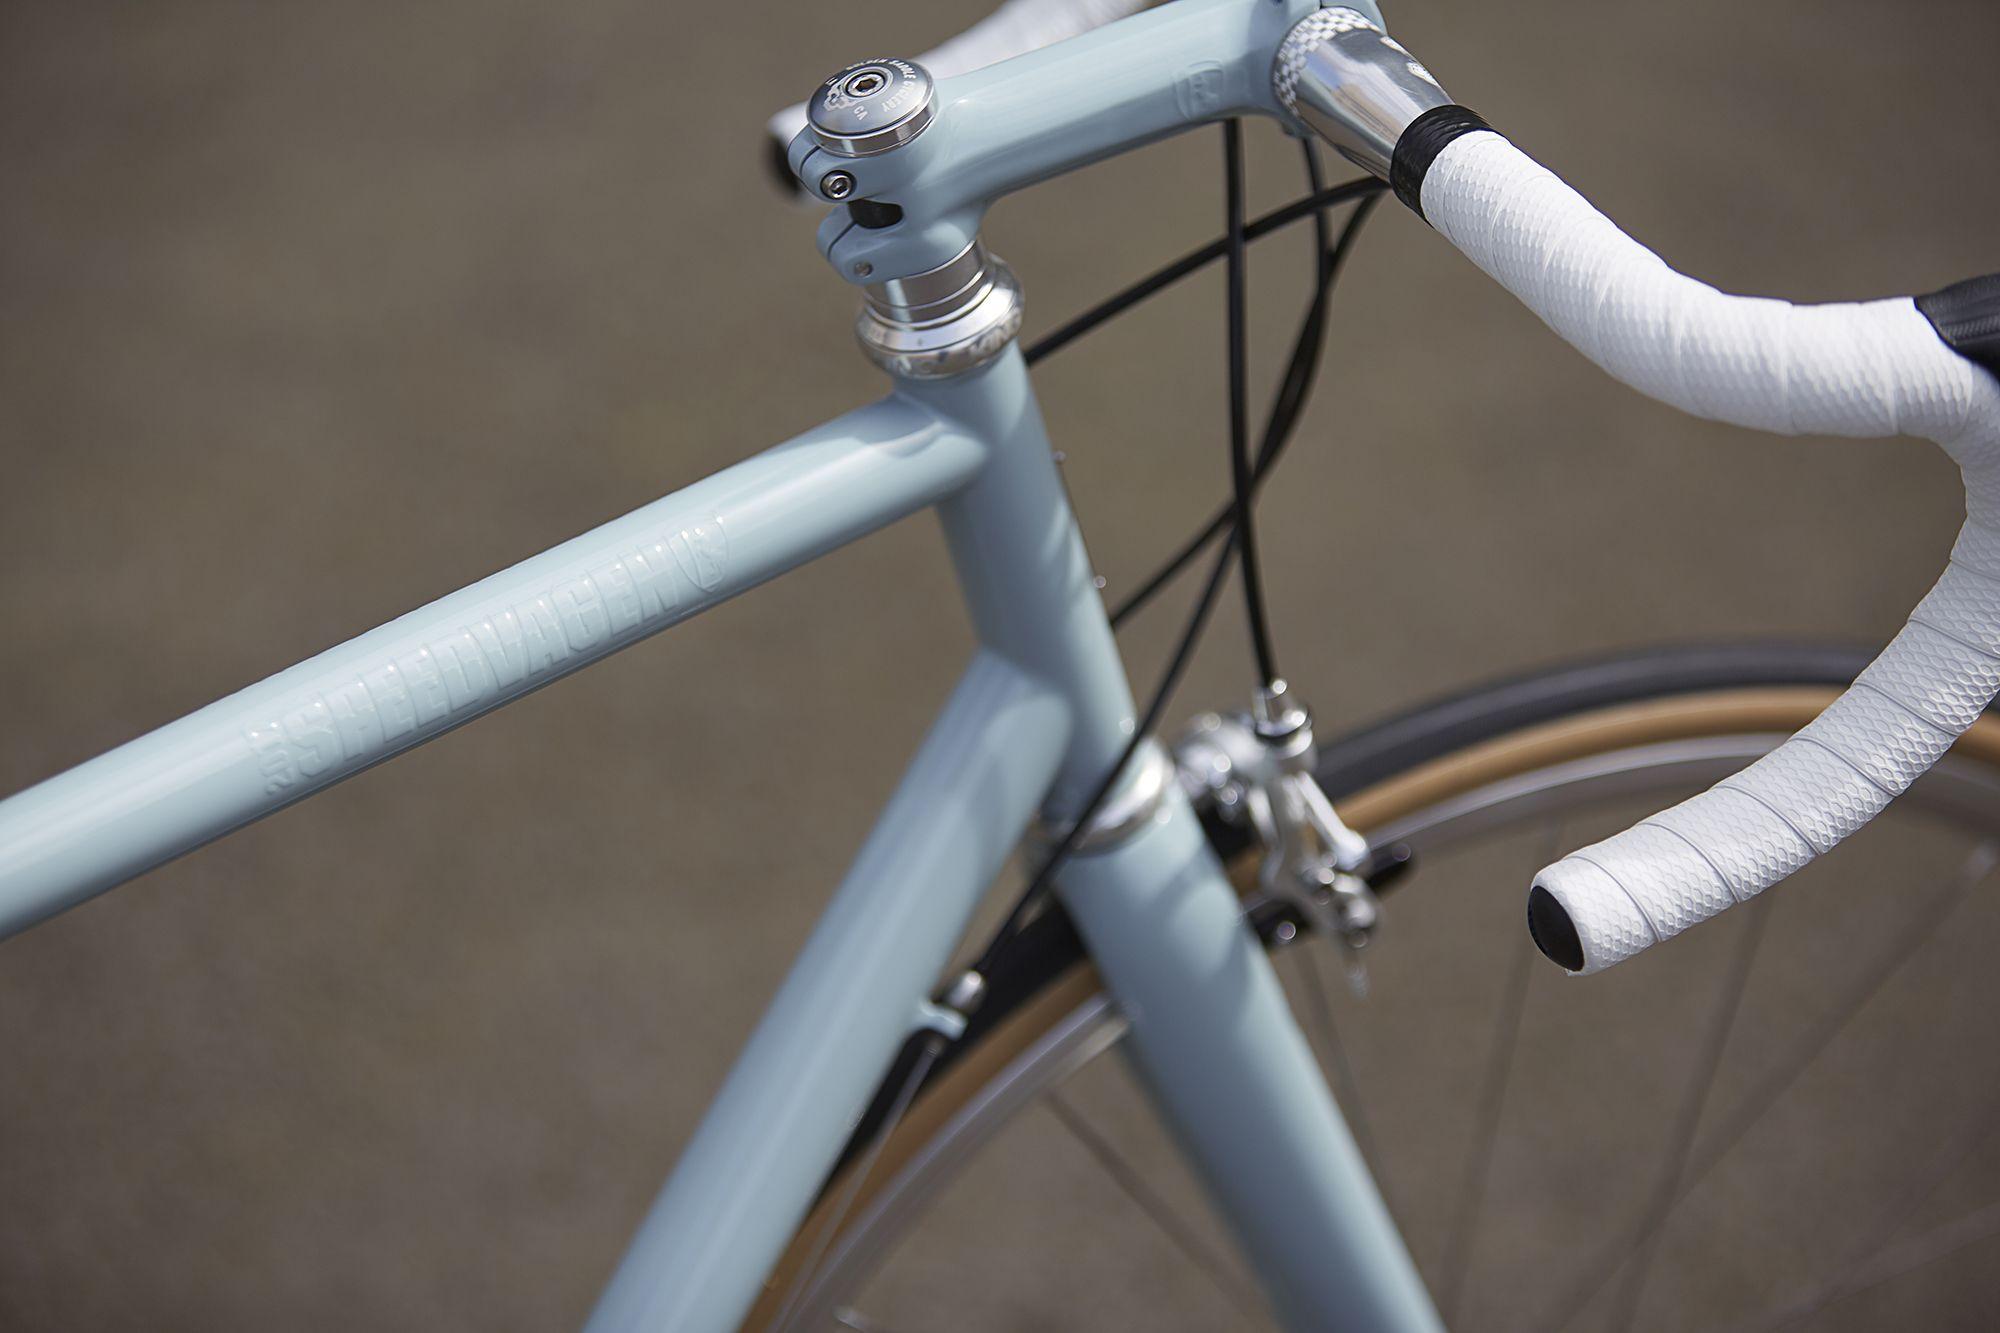 A Classic Speedvagen With Silver Components Classic Road Bike Bike Road Bike